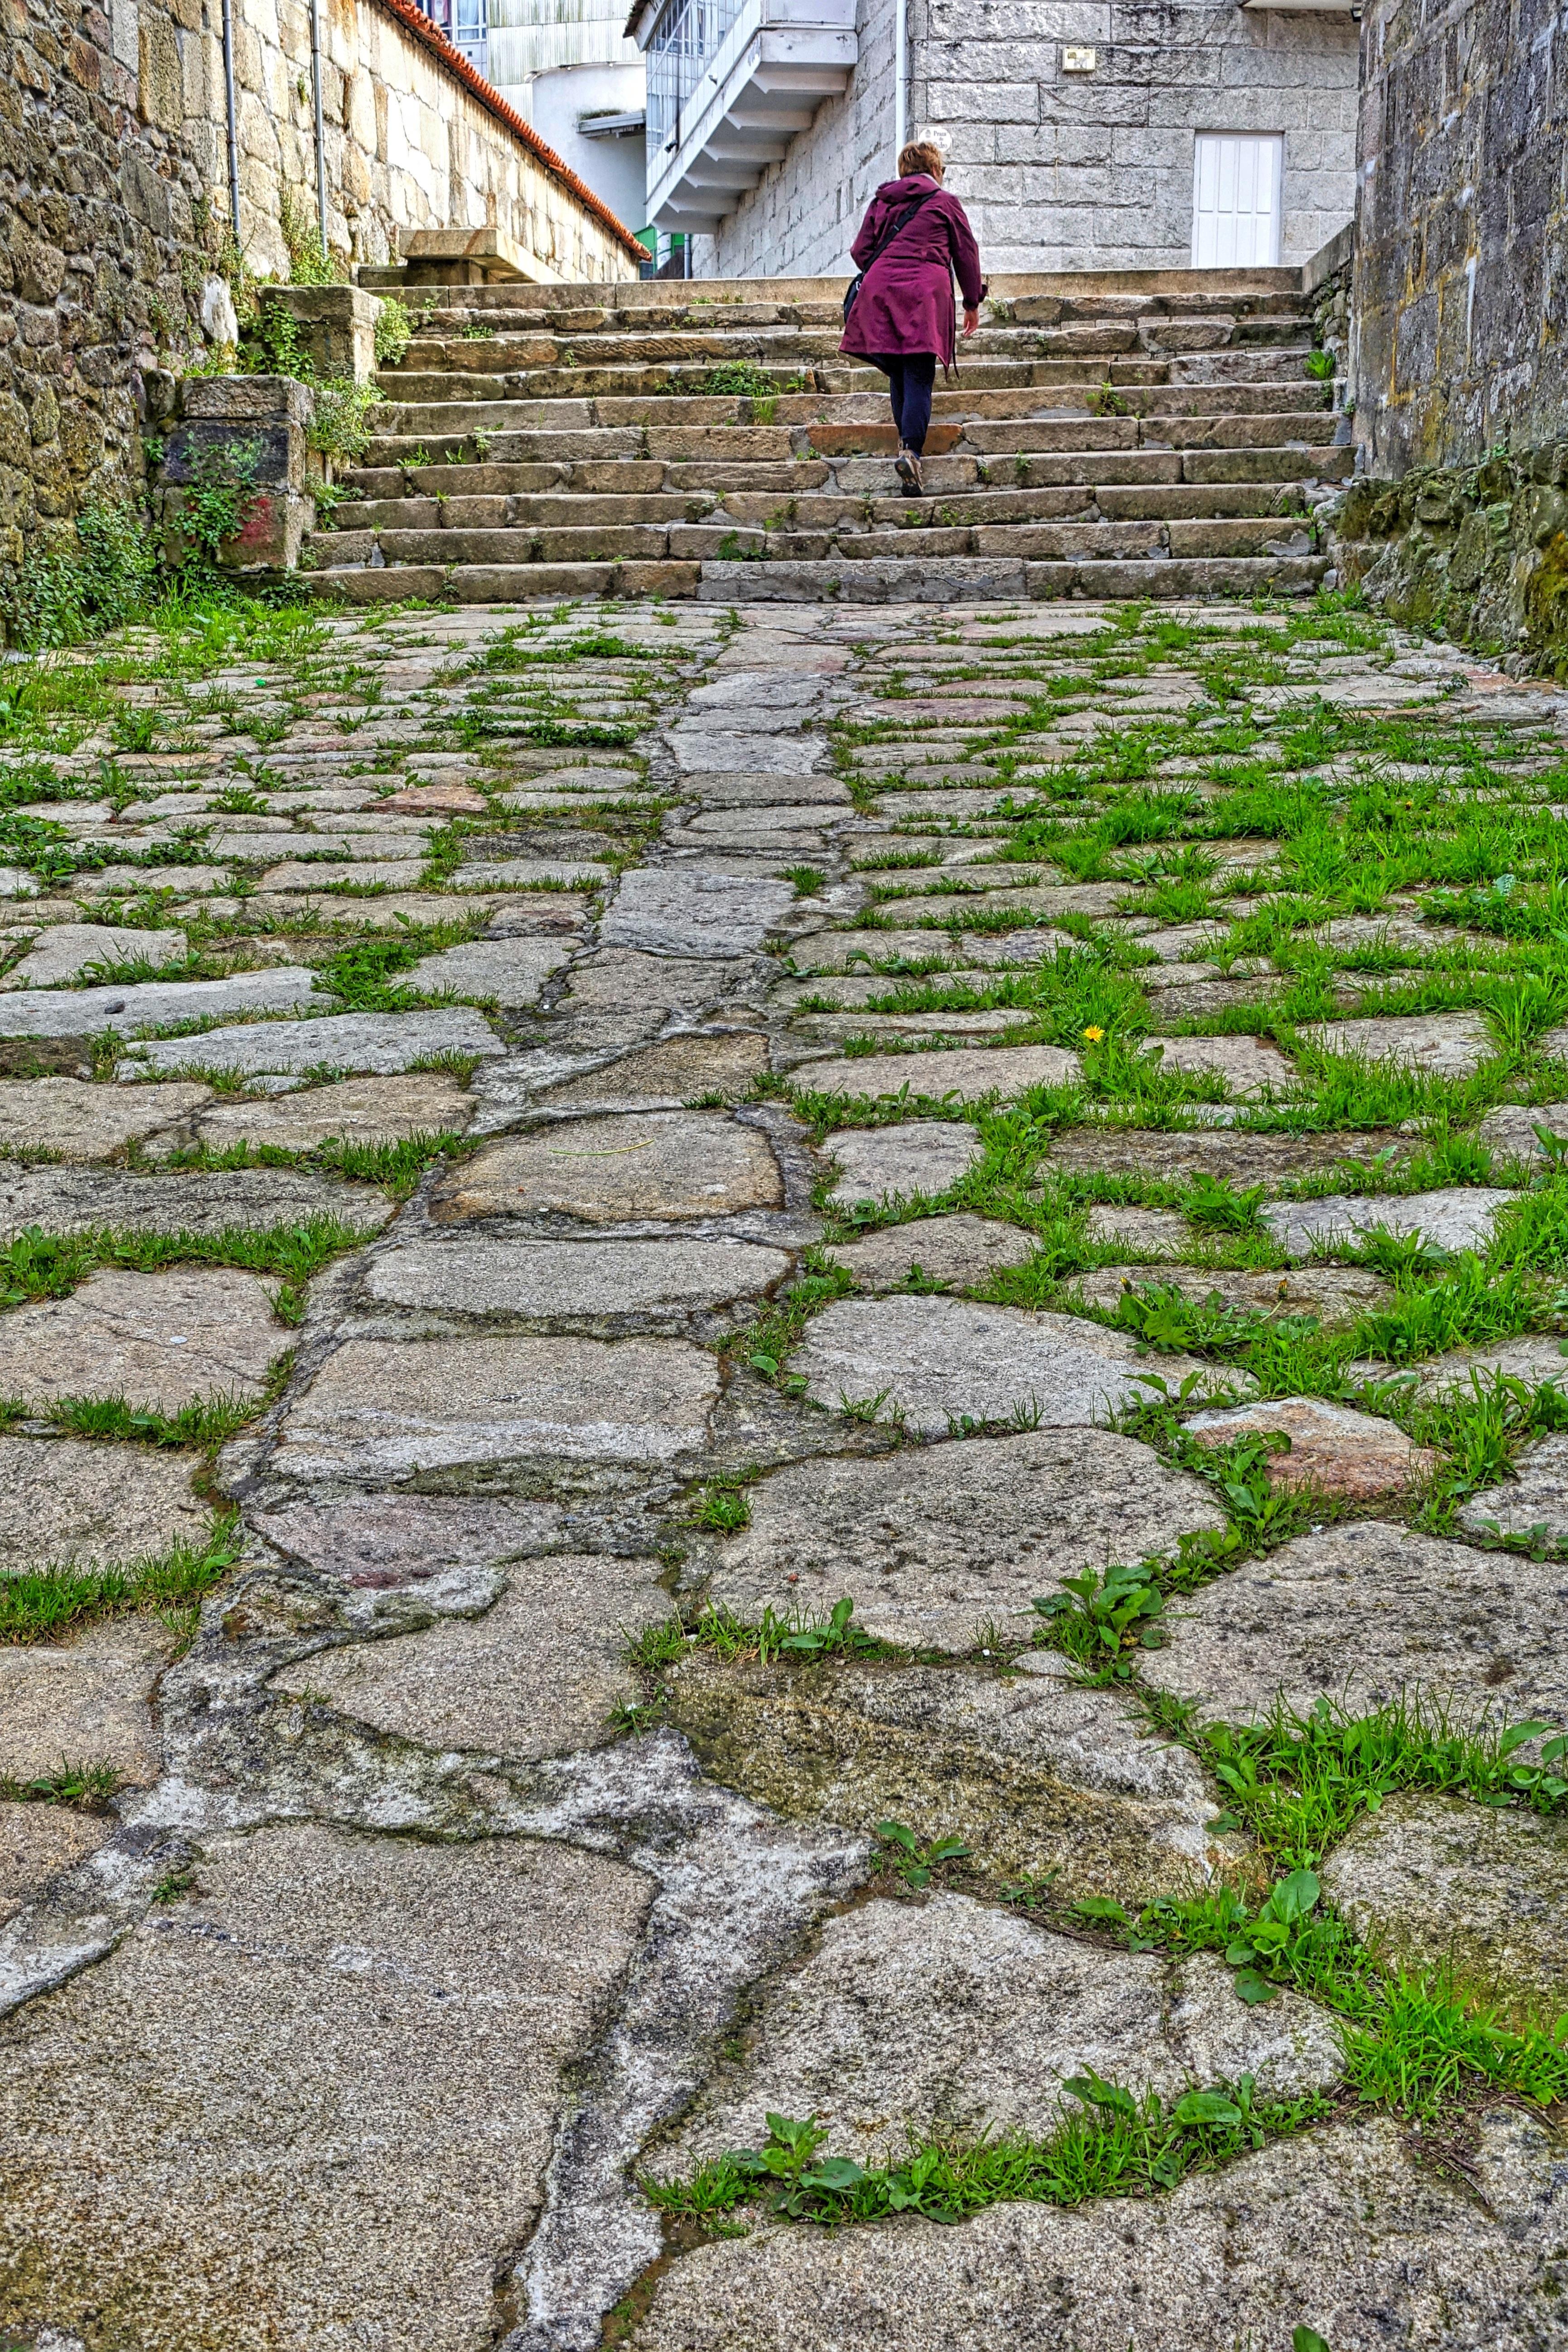 Path Pathway Grass Rock Street Lawn Sidewalk Cobblestone Wall Walkway Soil  Stone Wall Garden Brick Grassy